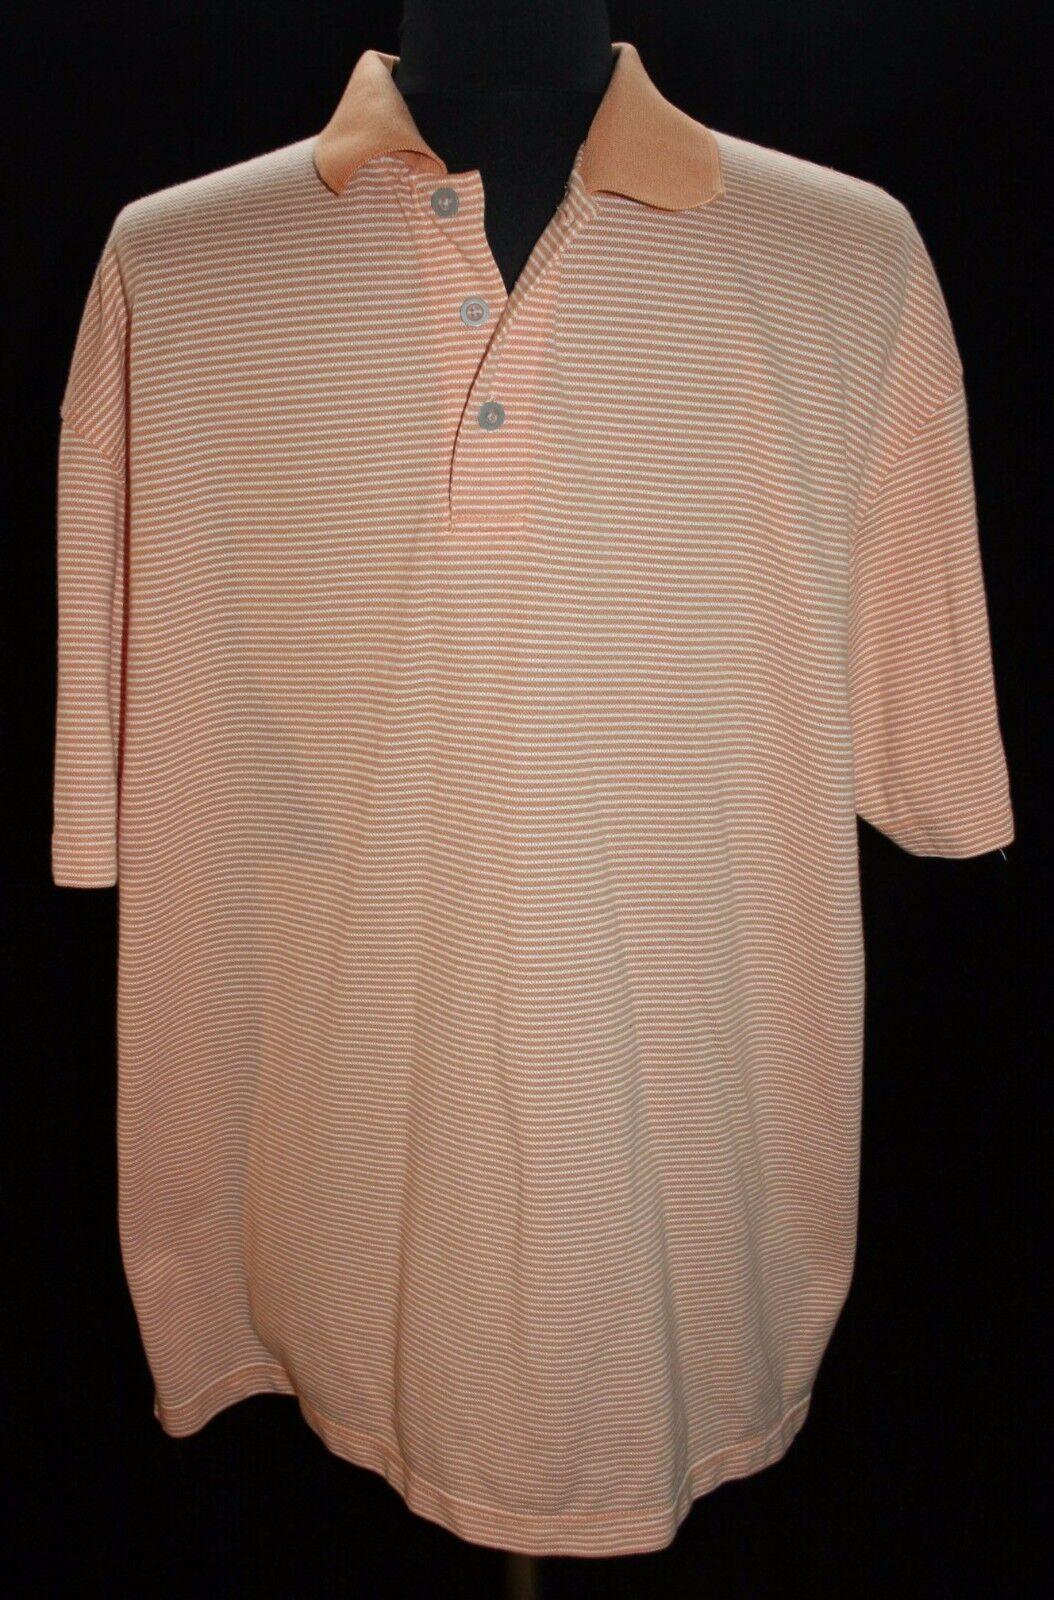 Mens Oobe Sz XL Peach Striped Polo Shirt Rugby Short Sleeve Casual